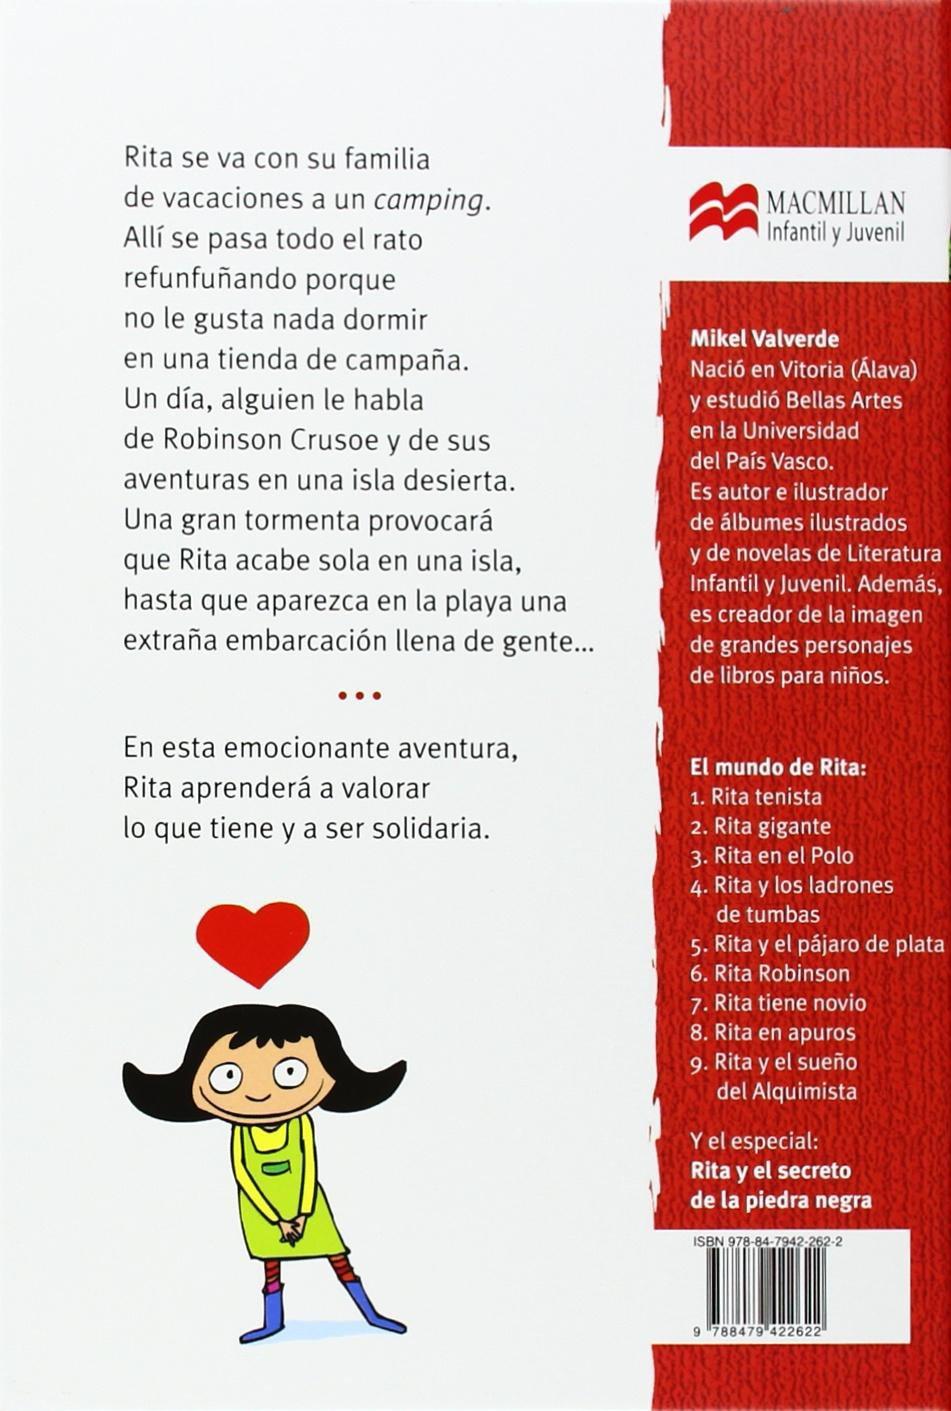 Rita Robinson (El Mundo de Rita) (Spanish Edition): Mikel Valverde: 9788479422622: Amazon.com: Books